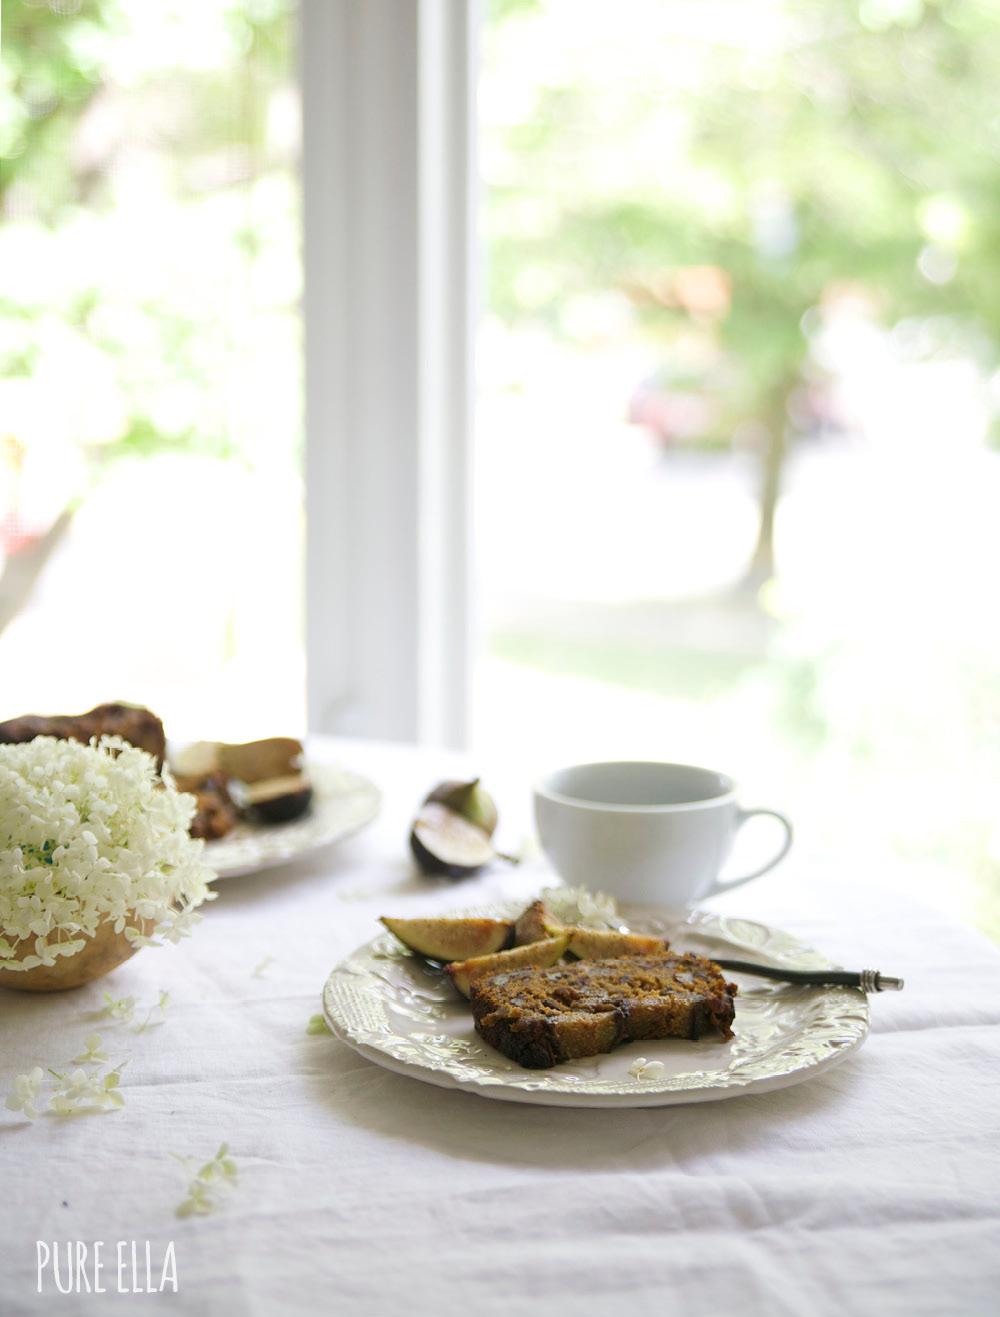 Pure-Ella-Gluten-free-Vegan-Banana-Bread-with-Figs-and-Walnuts5